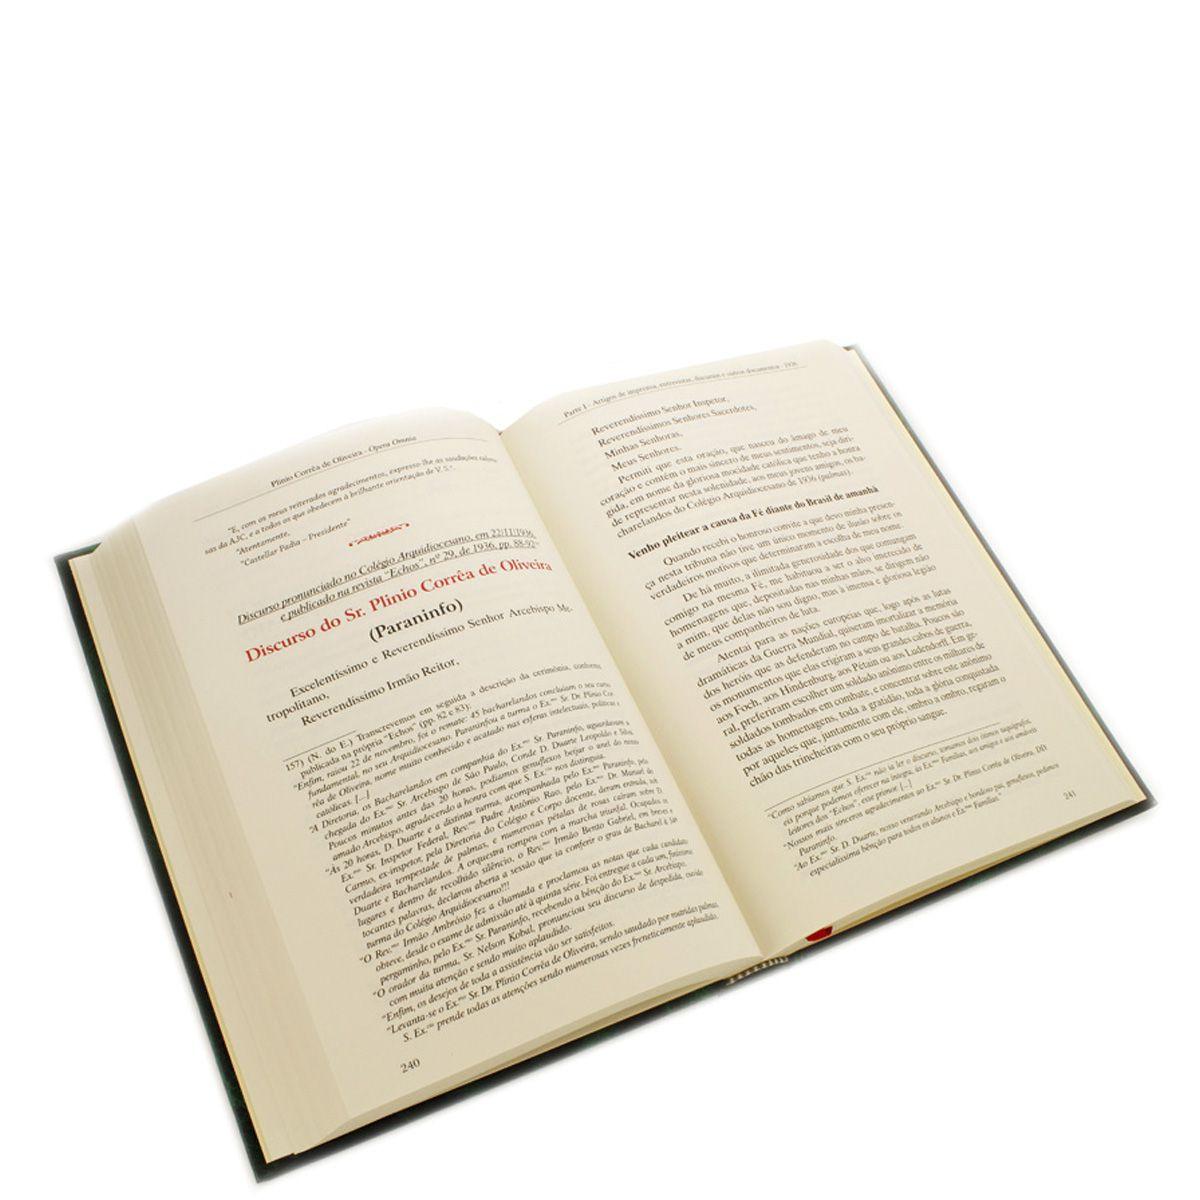 Livro - Opera Omnia de Plinio Correa de Oliveira - Vol III